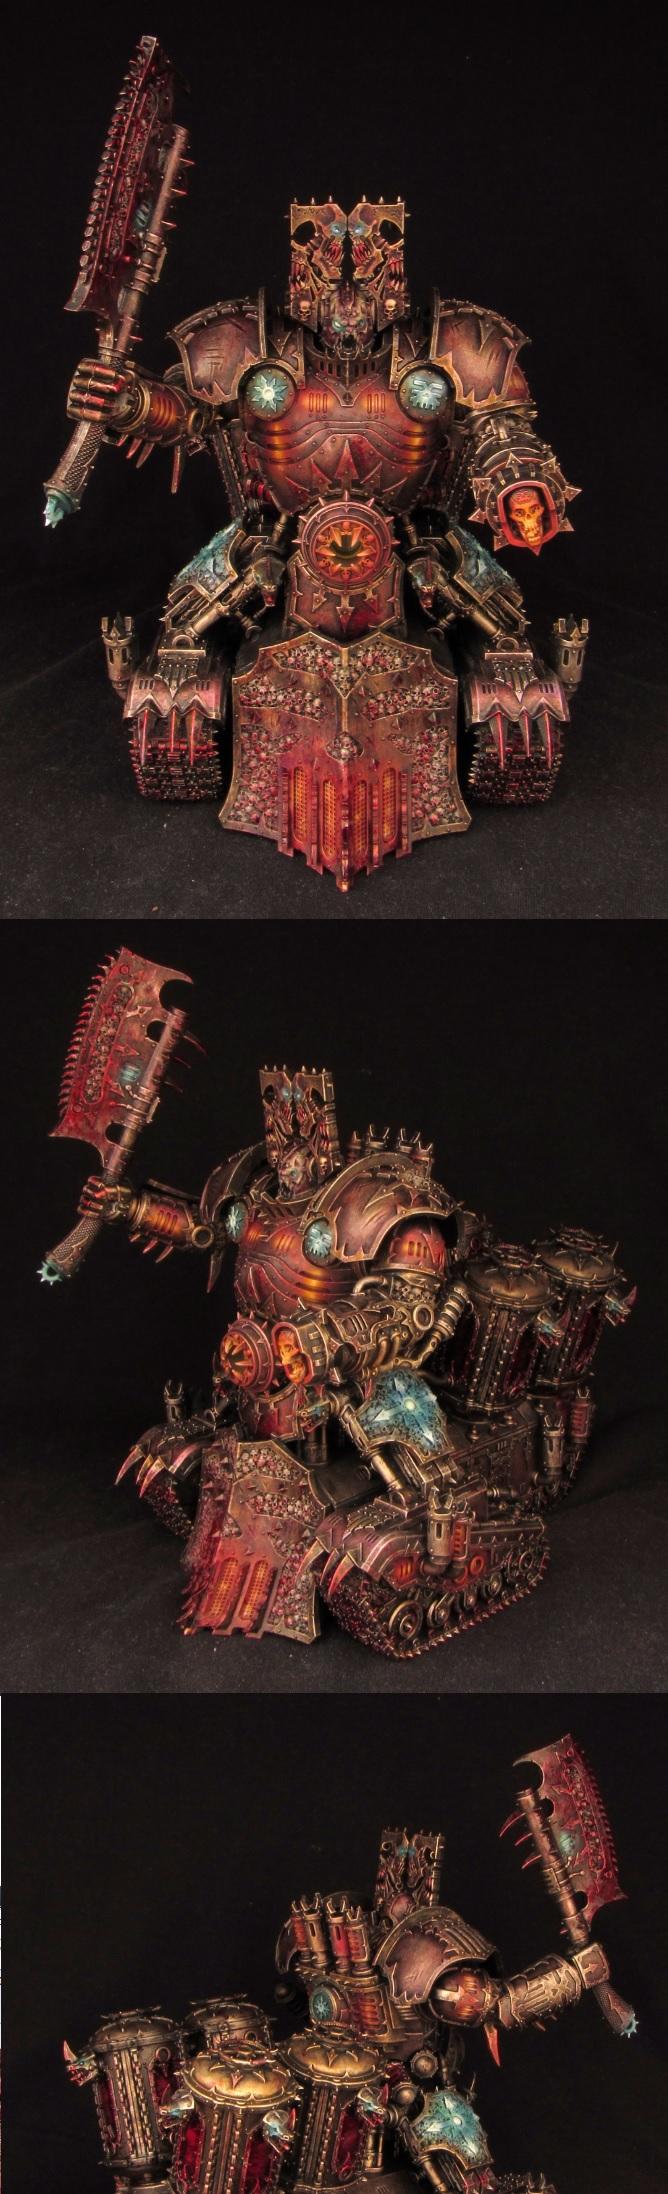 Warhammer 40k   Chaos Space Marines   Khorne Lord of Skulls #warhammer #40k #40000 #wh40k #wh40000 #warhammer40k #gw #gamesworkshop #wellofeterntiy #miniatures #wargaming #hobby #tabletop